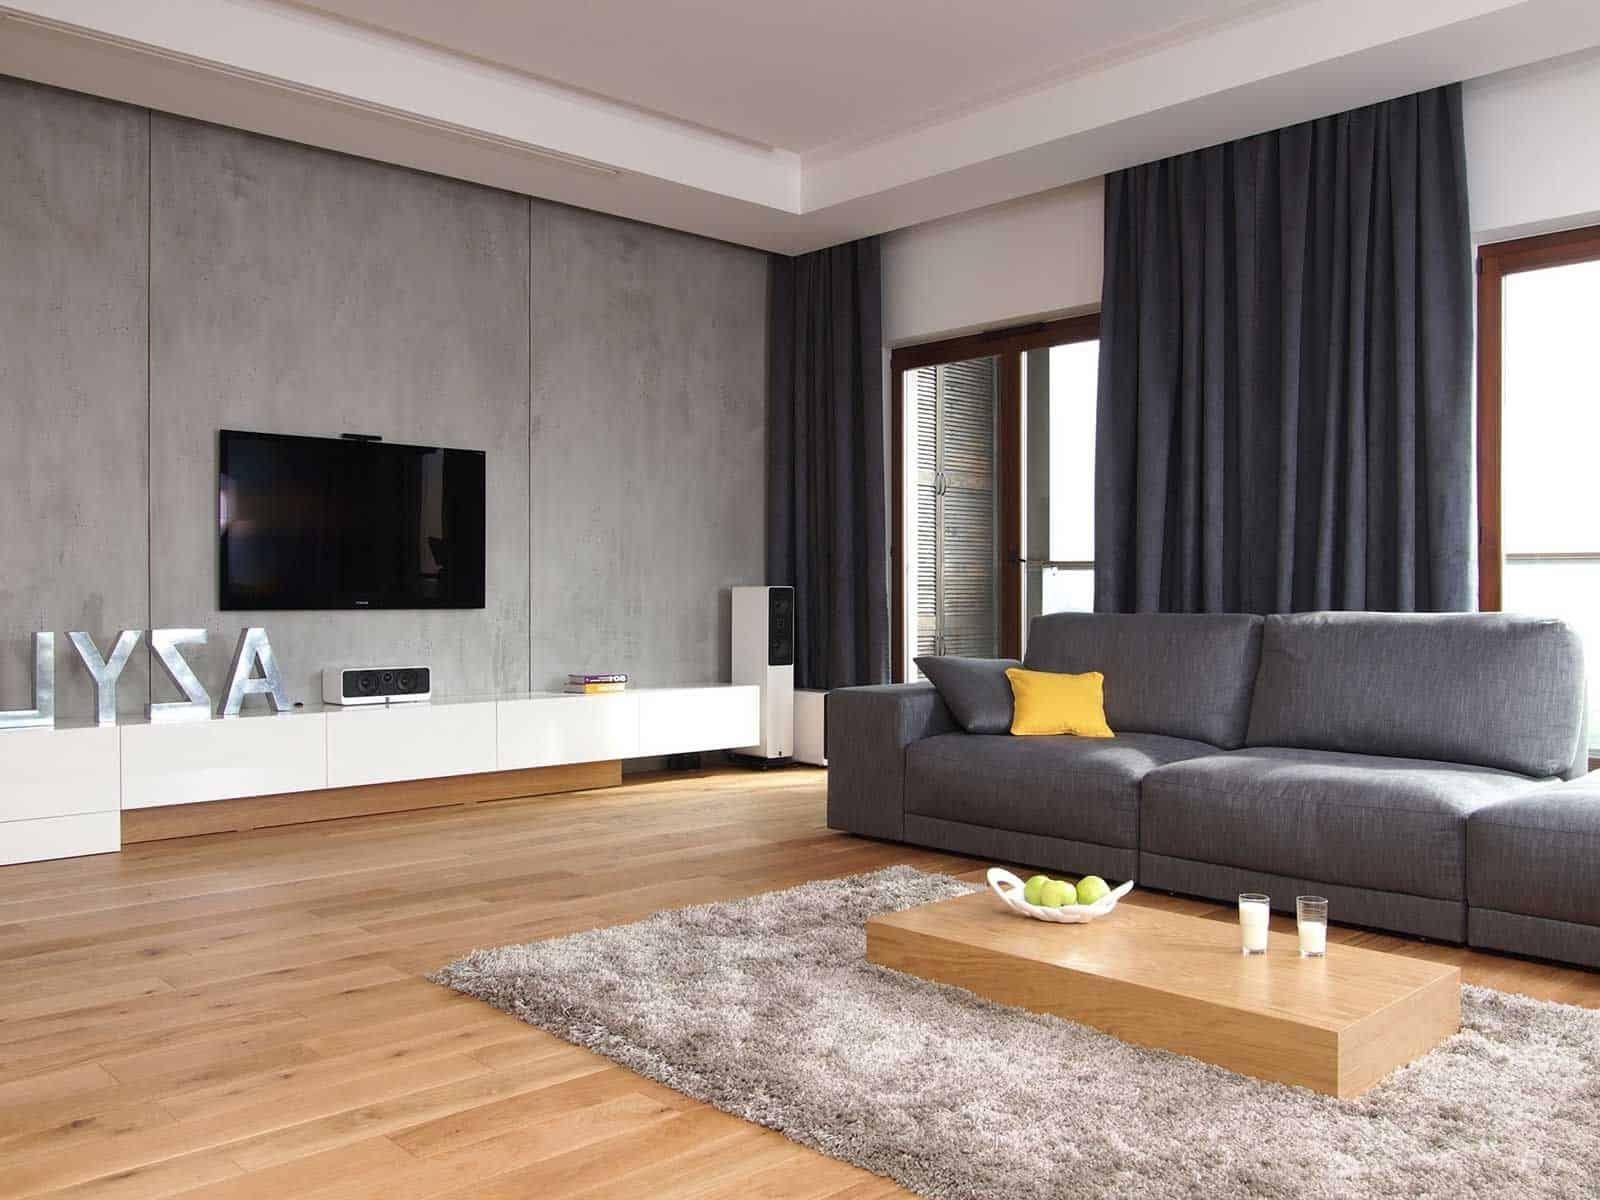 shag rug in living room